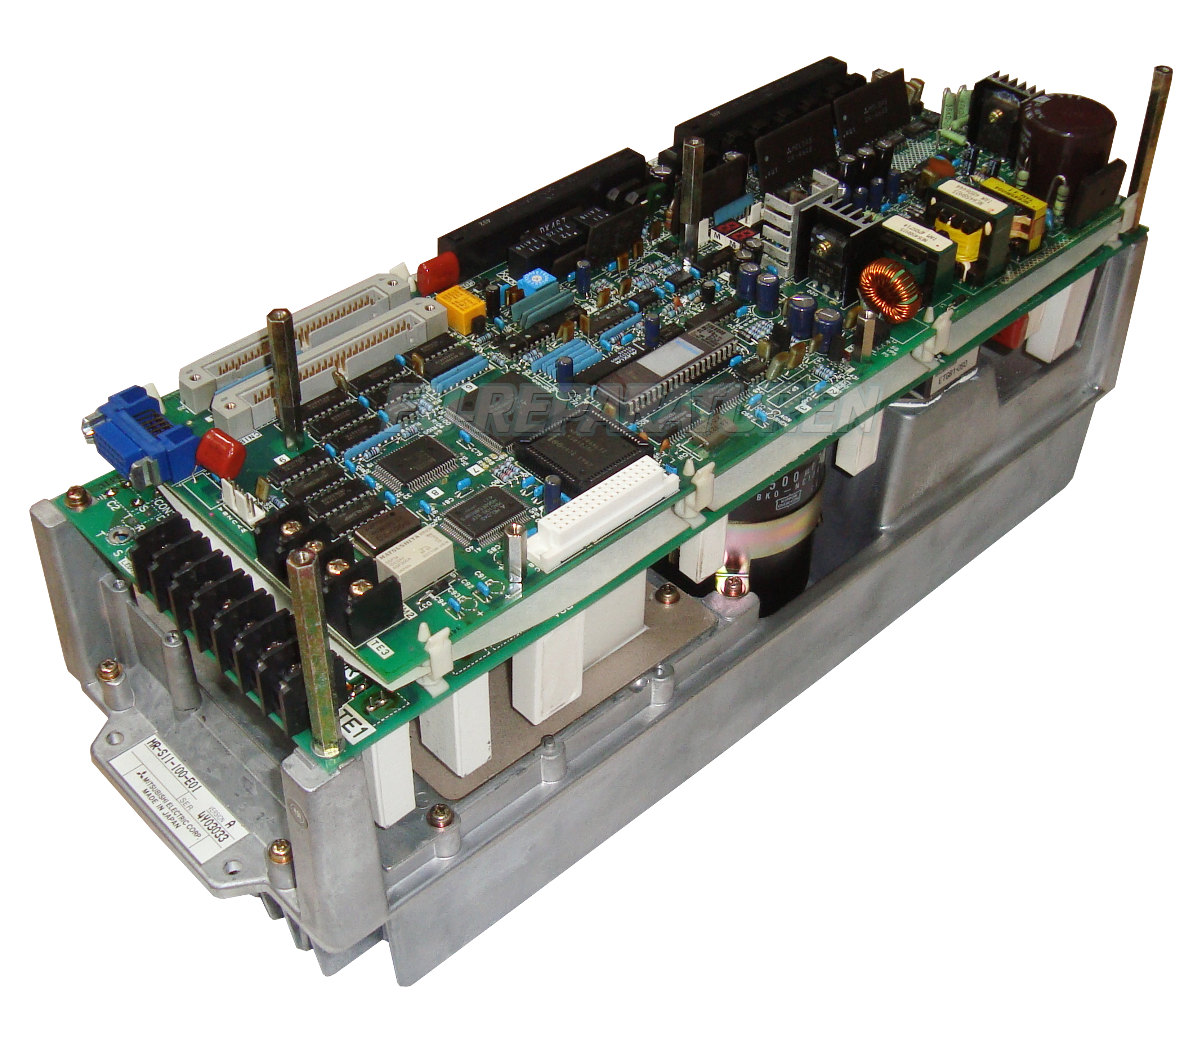 SHOP, Kaufen: MITSUBISHI ELECTRIC MR-S11-100-E01 FREQUENZUMFORMER